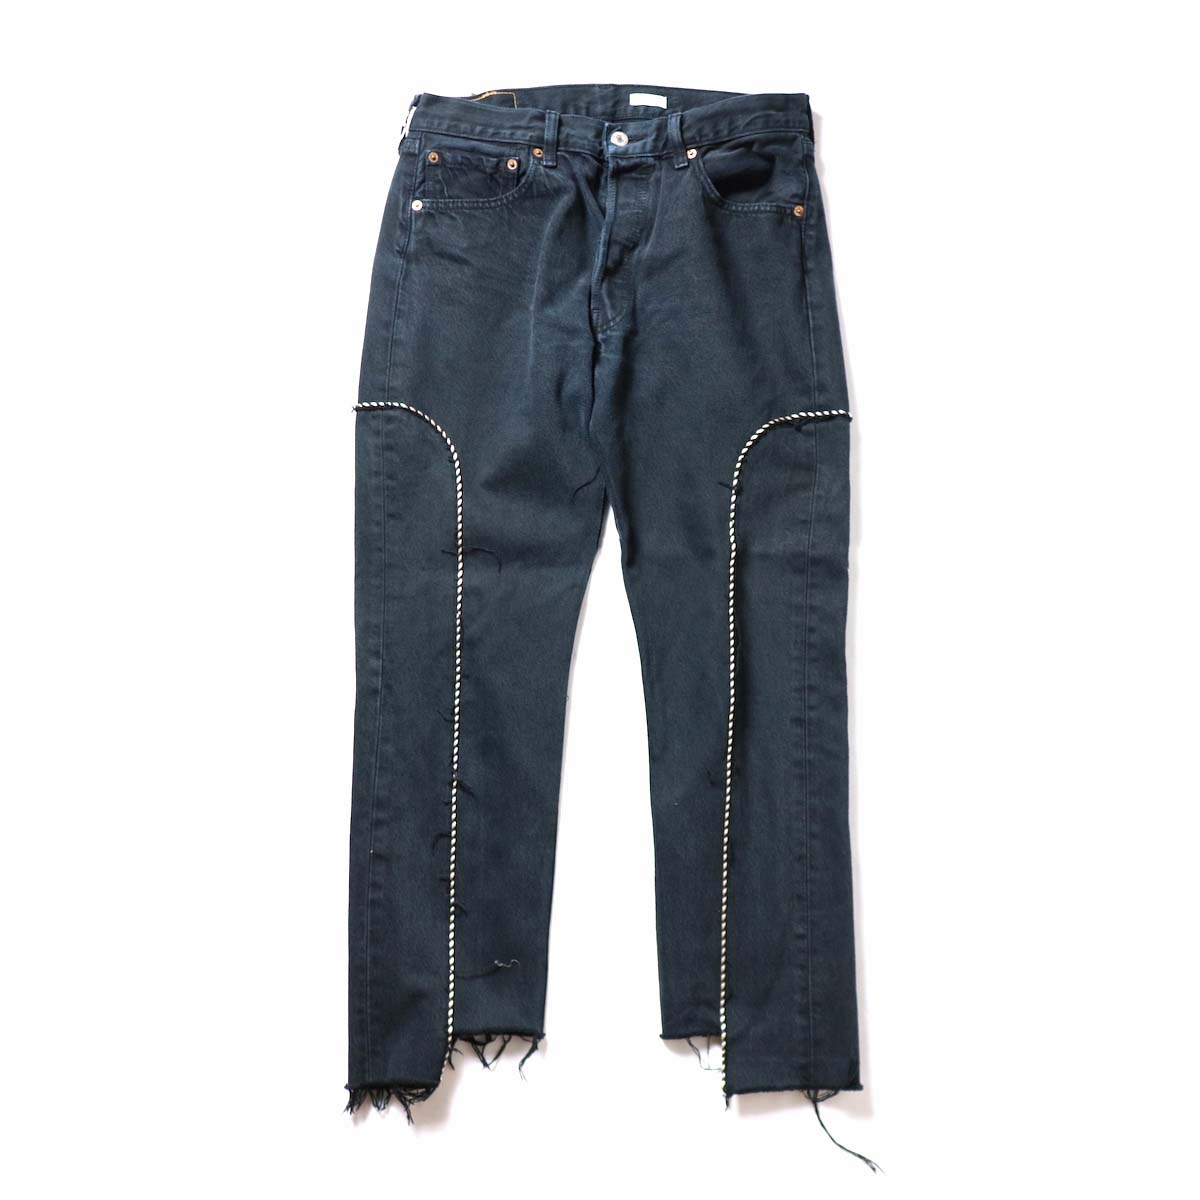 OLD PARK / Western Jeans Black (Msize-G)